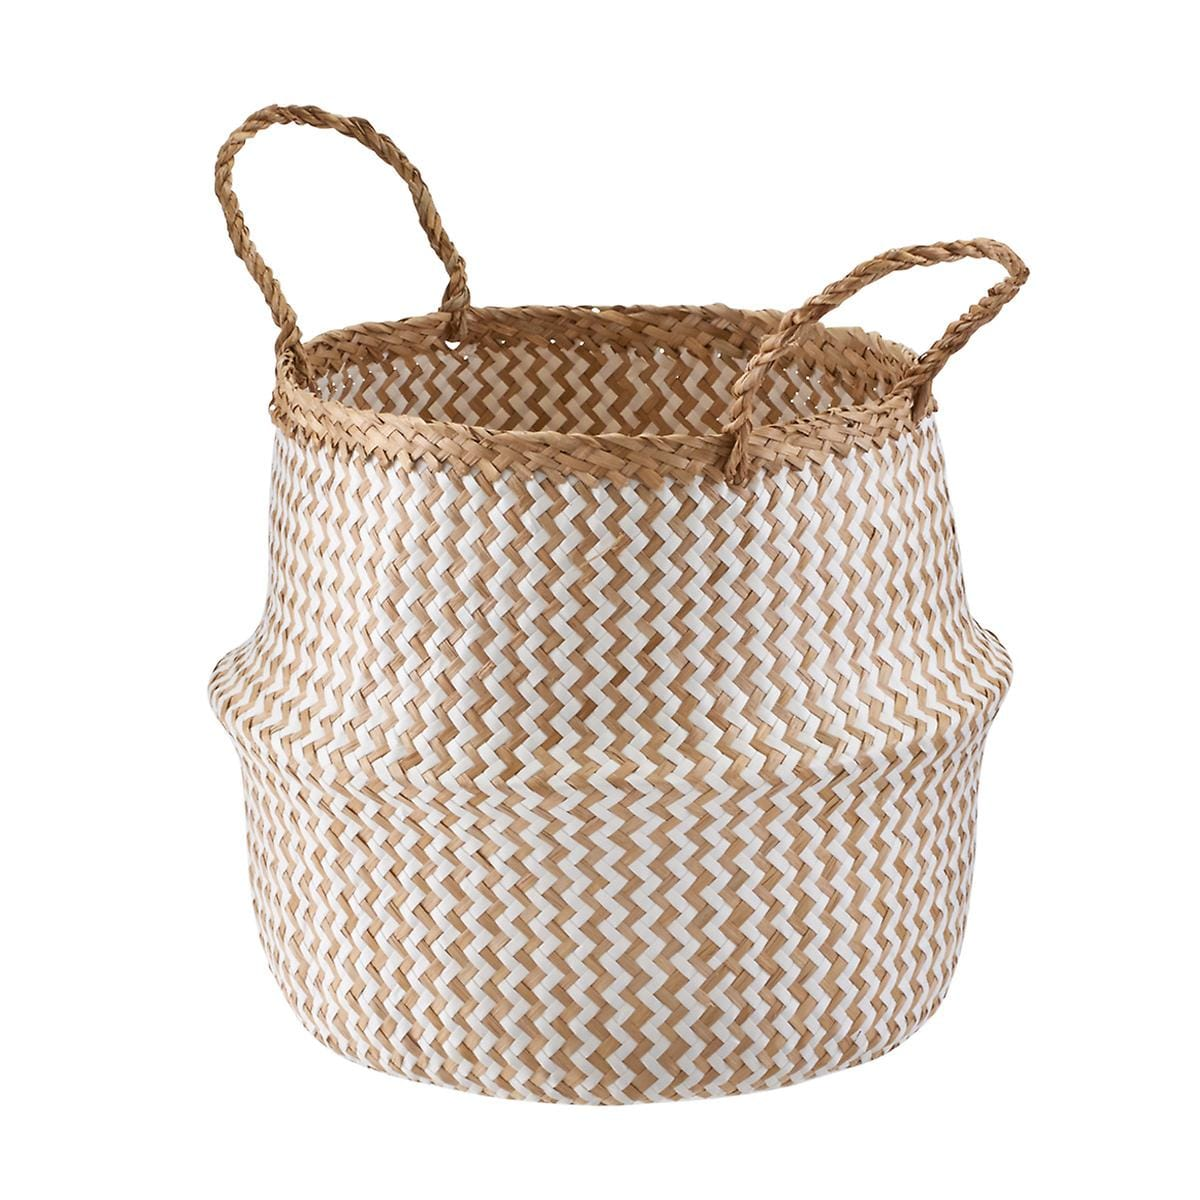 Medium Seagrass BellyBasket Chevron Natural/White